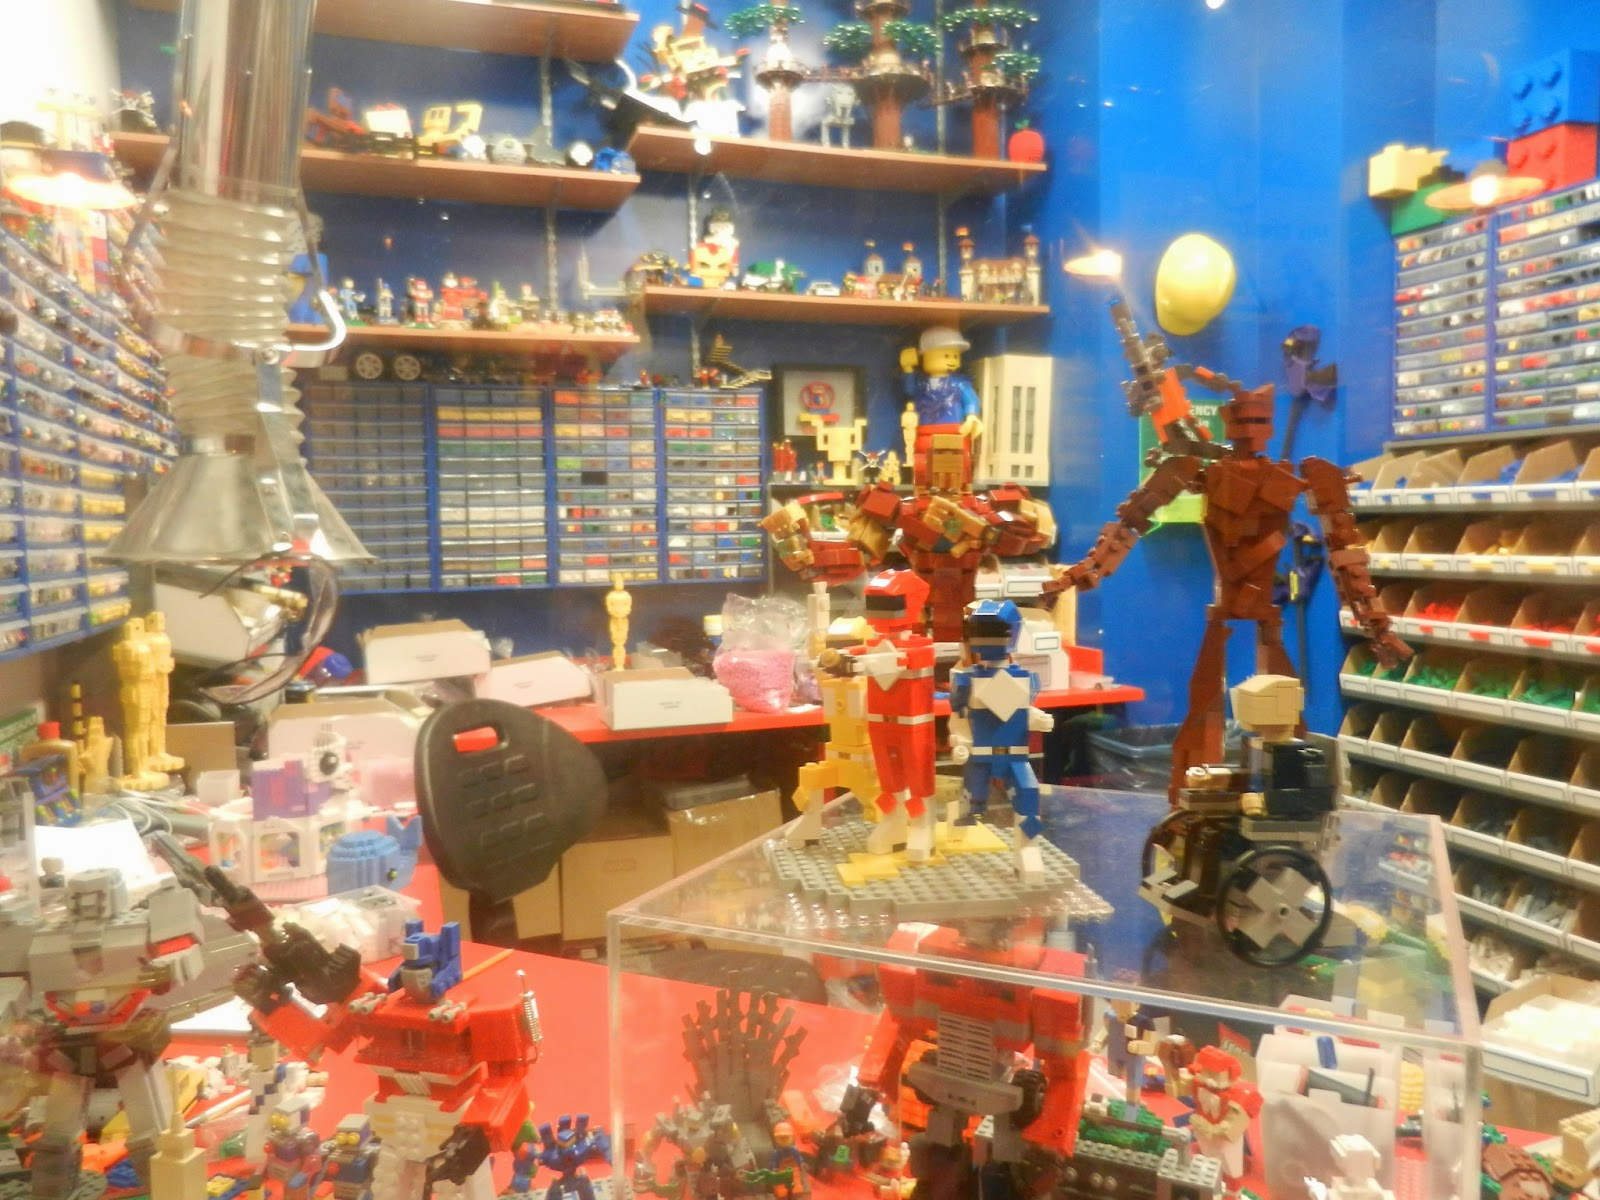 The Kerrie Show: #LegoLand Discovery Center Kansas City ...